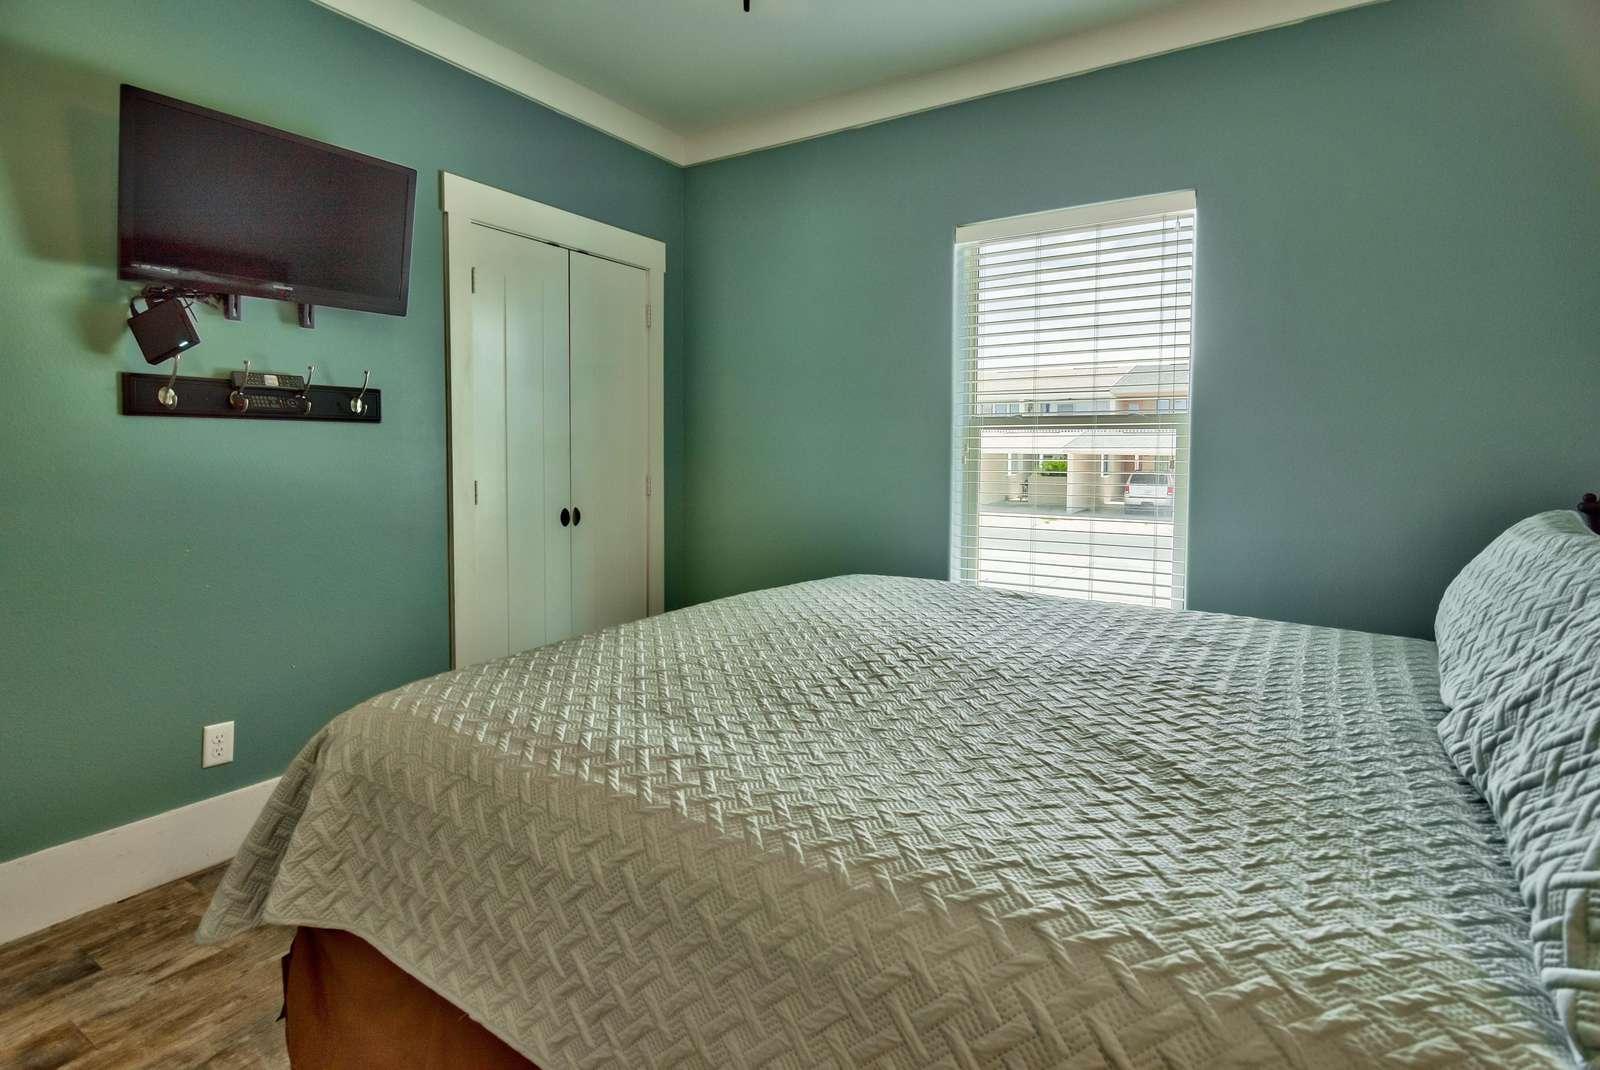 Bedroom 2 - 2nd View